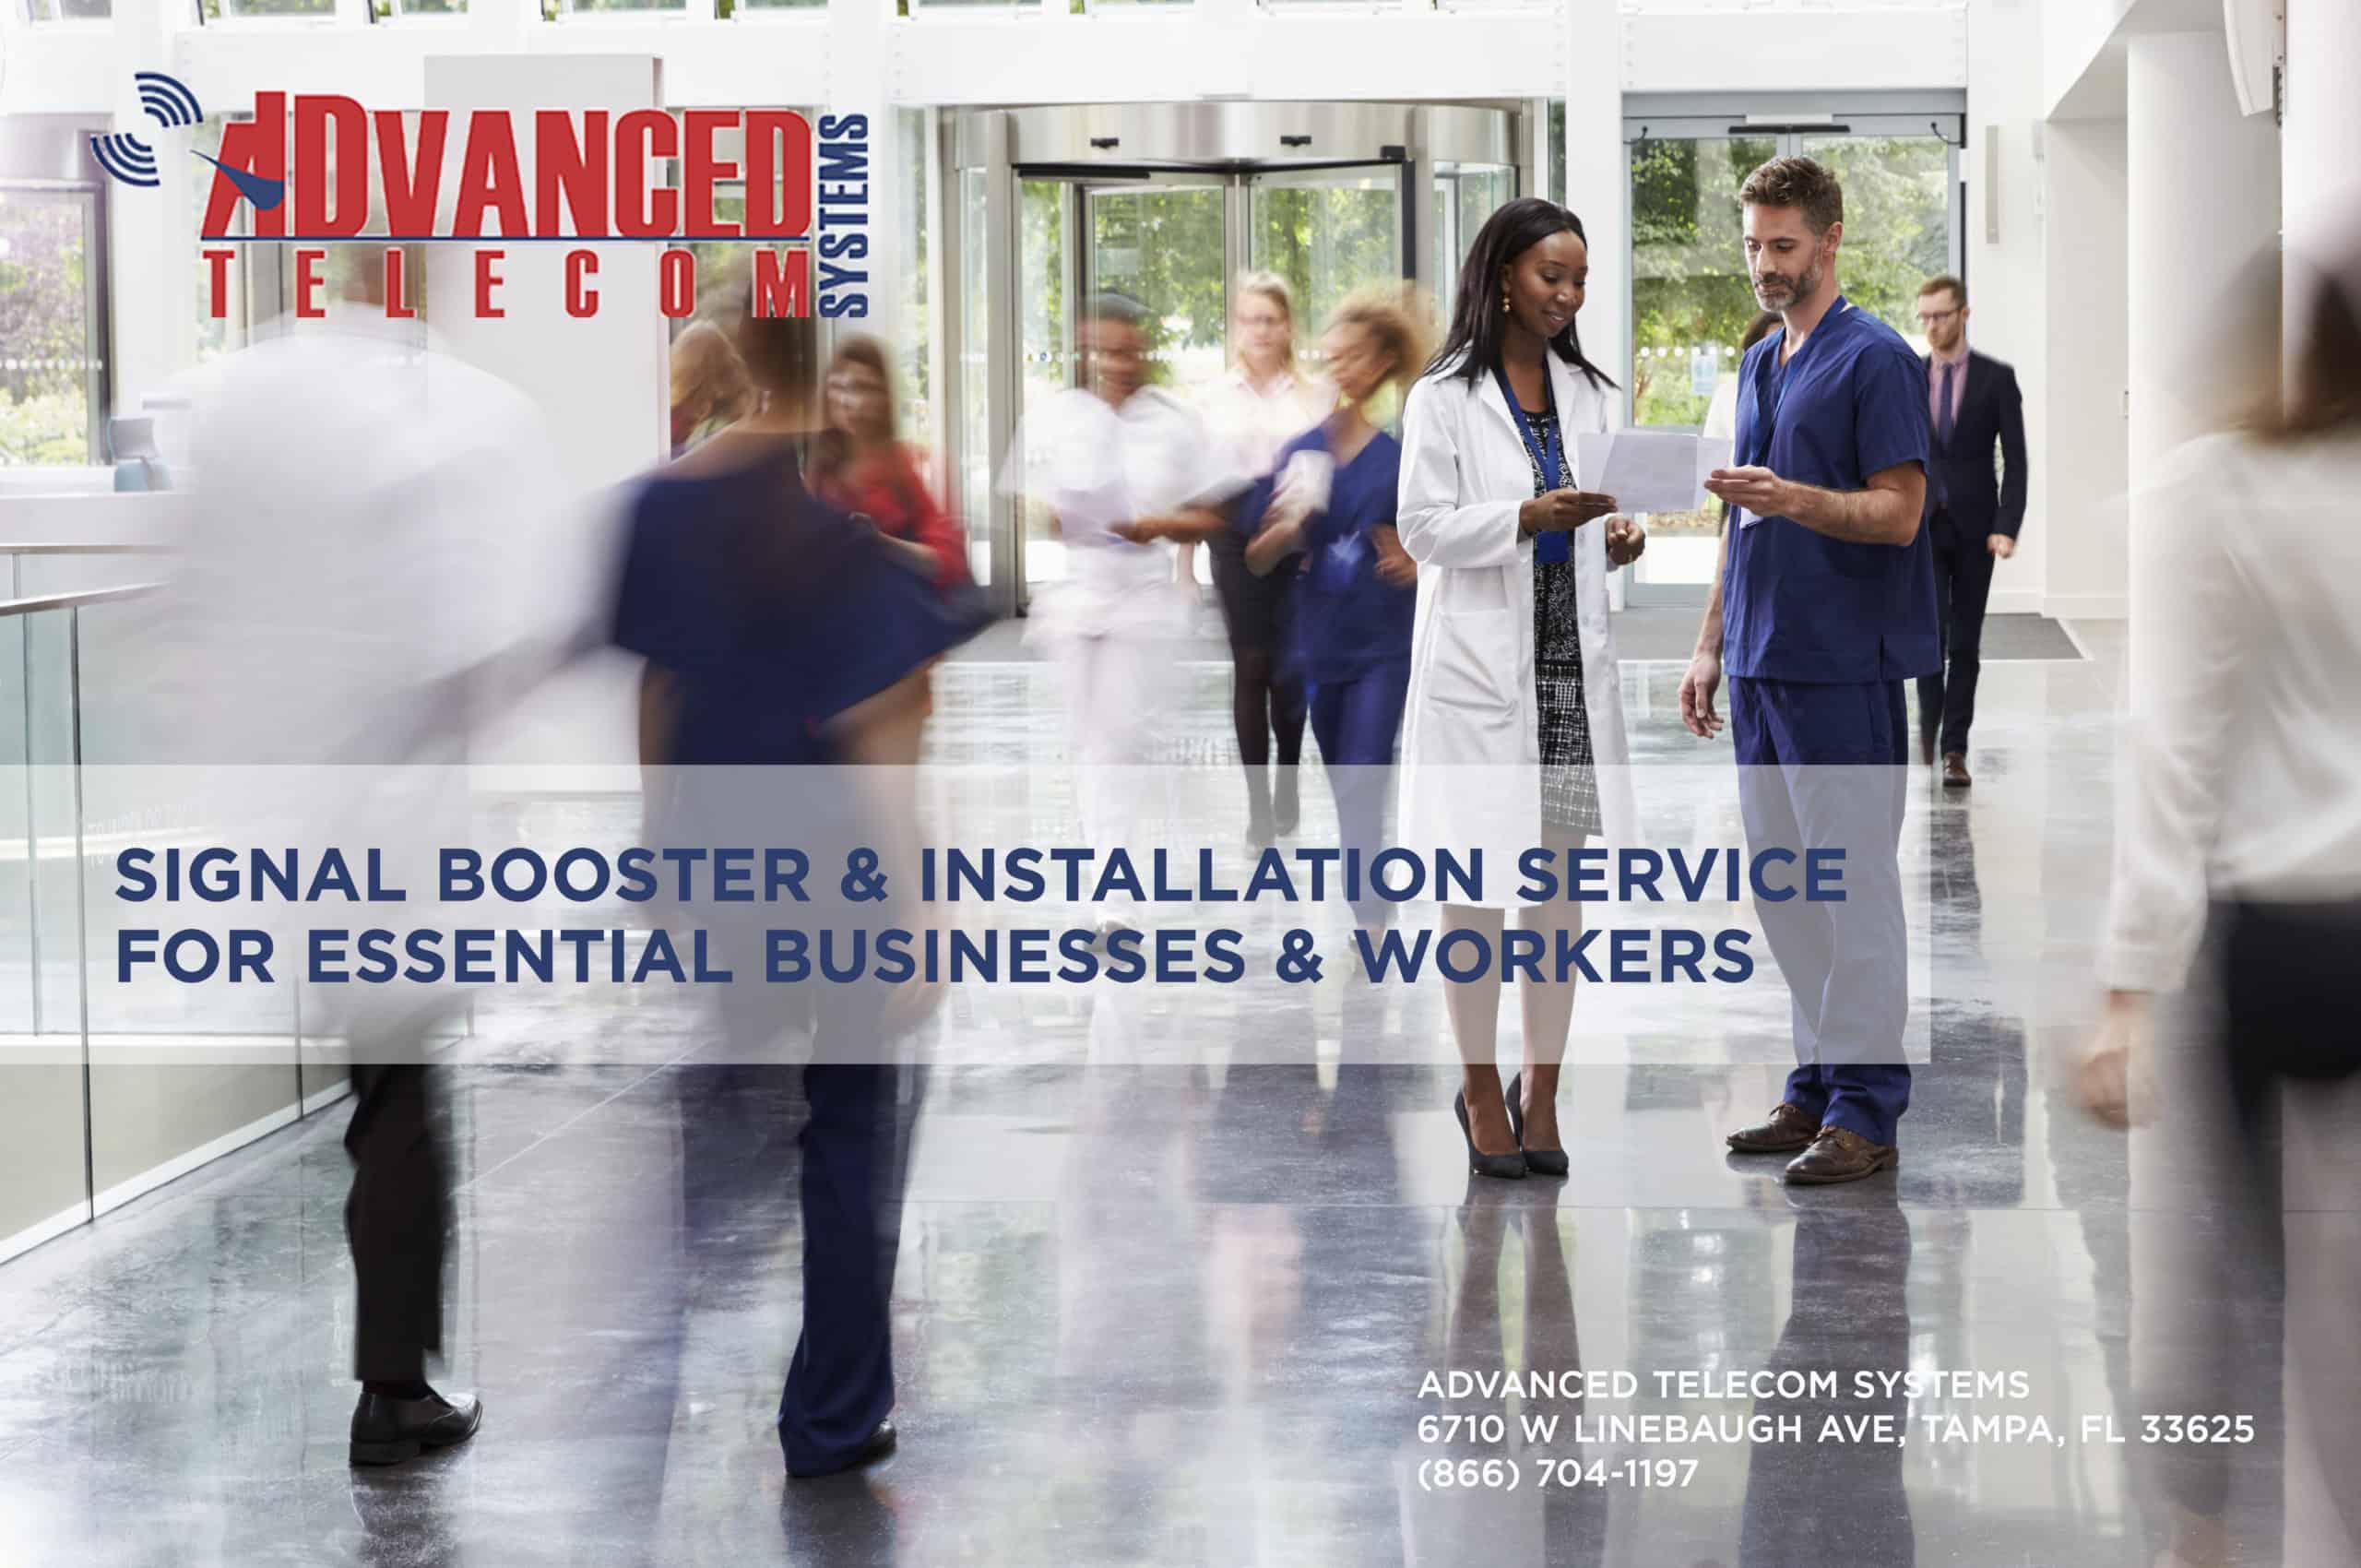 signal booster & installation service